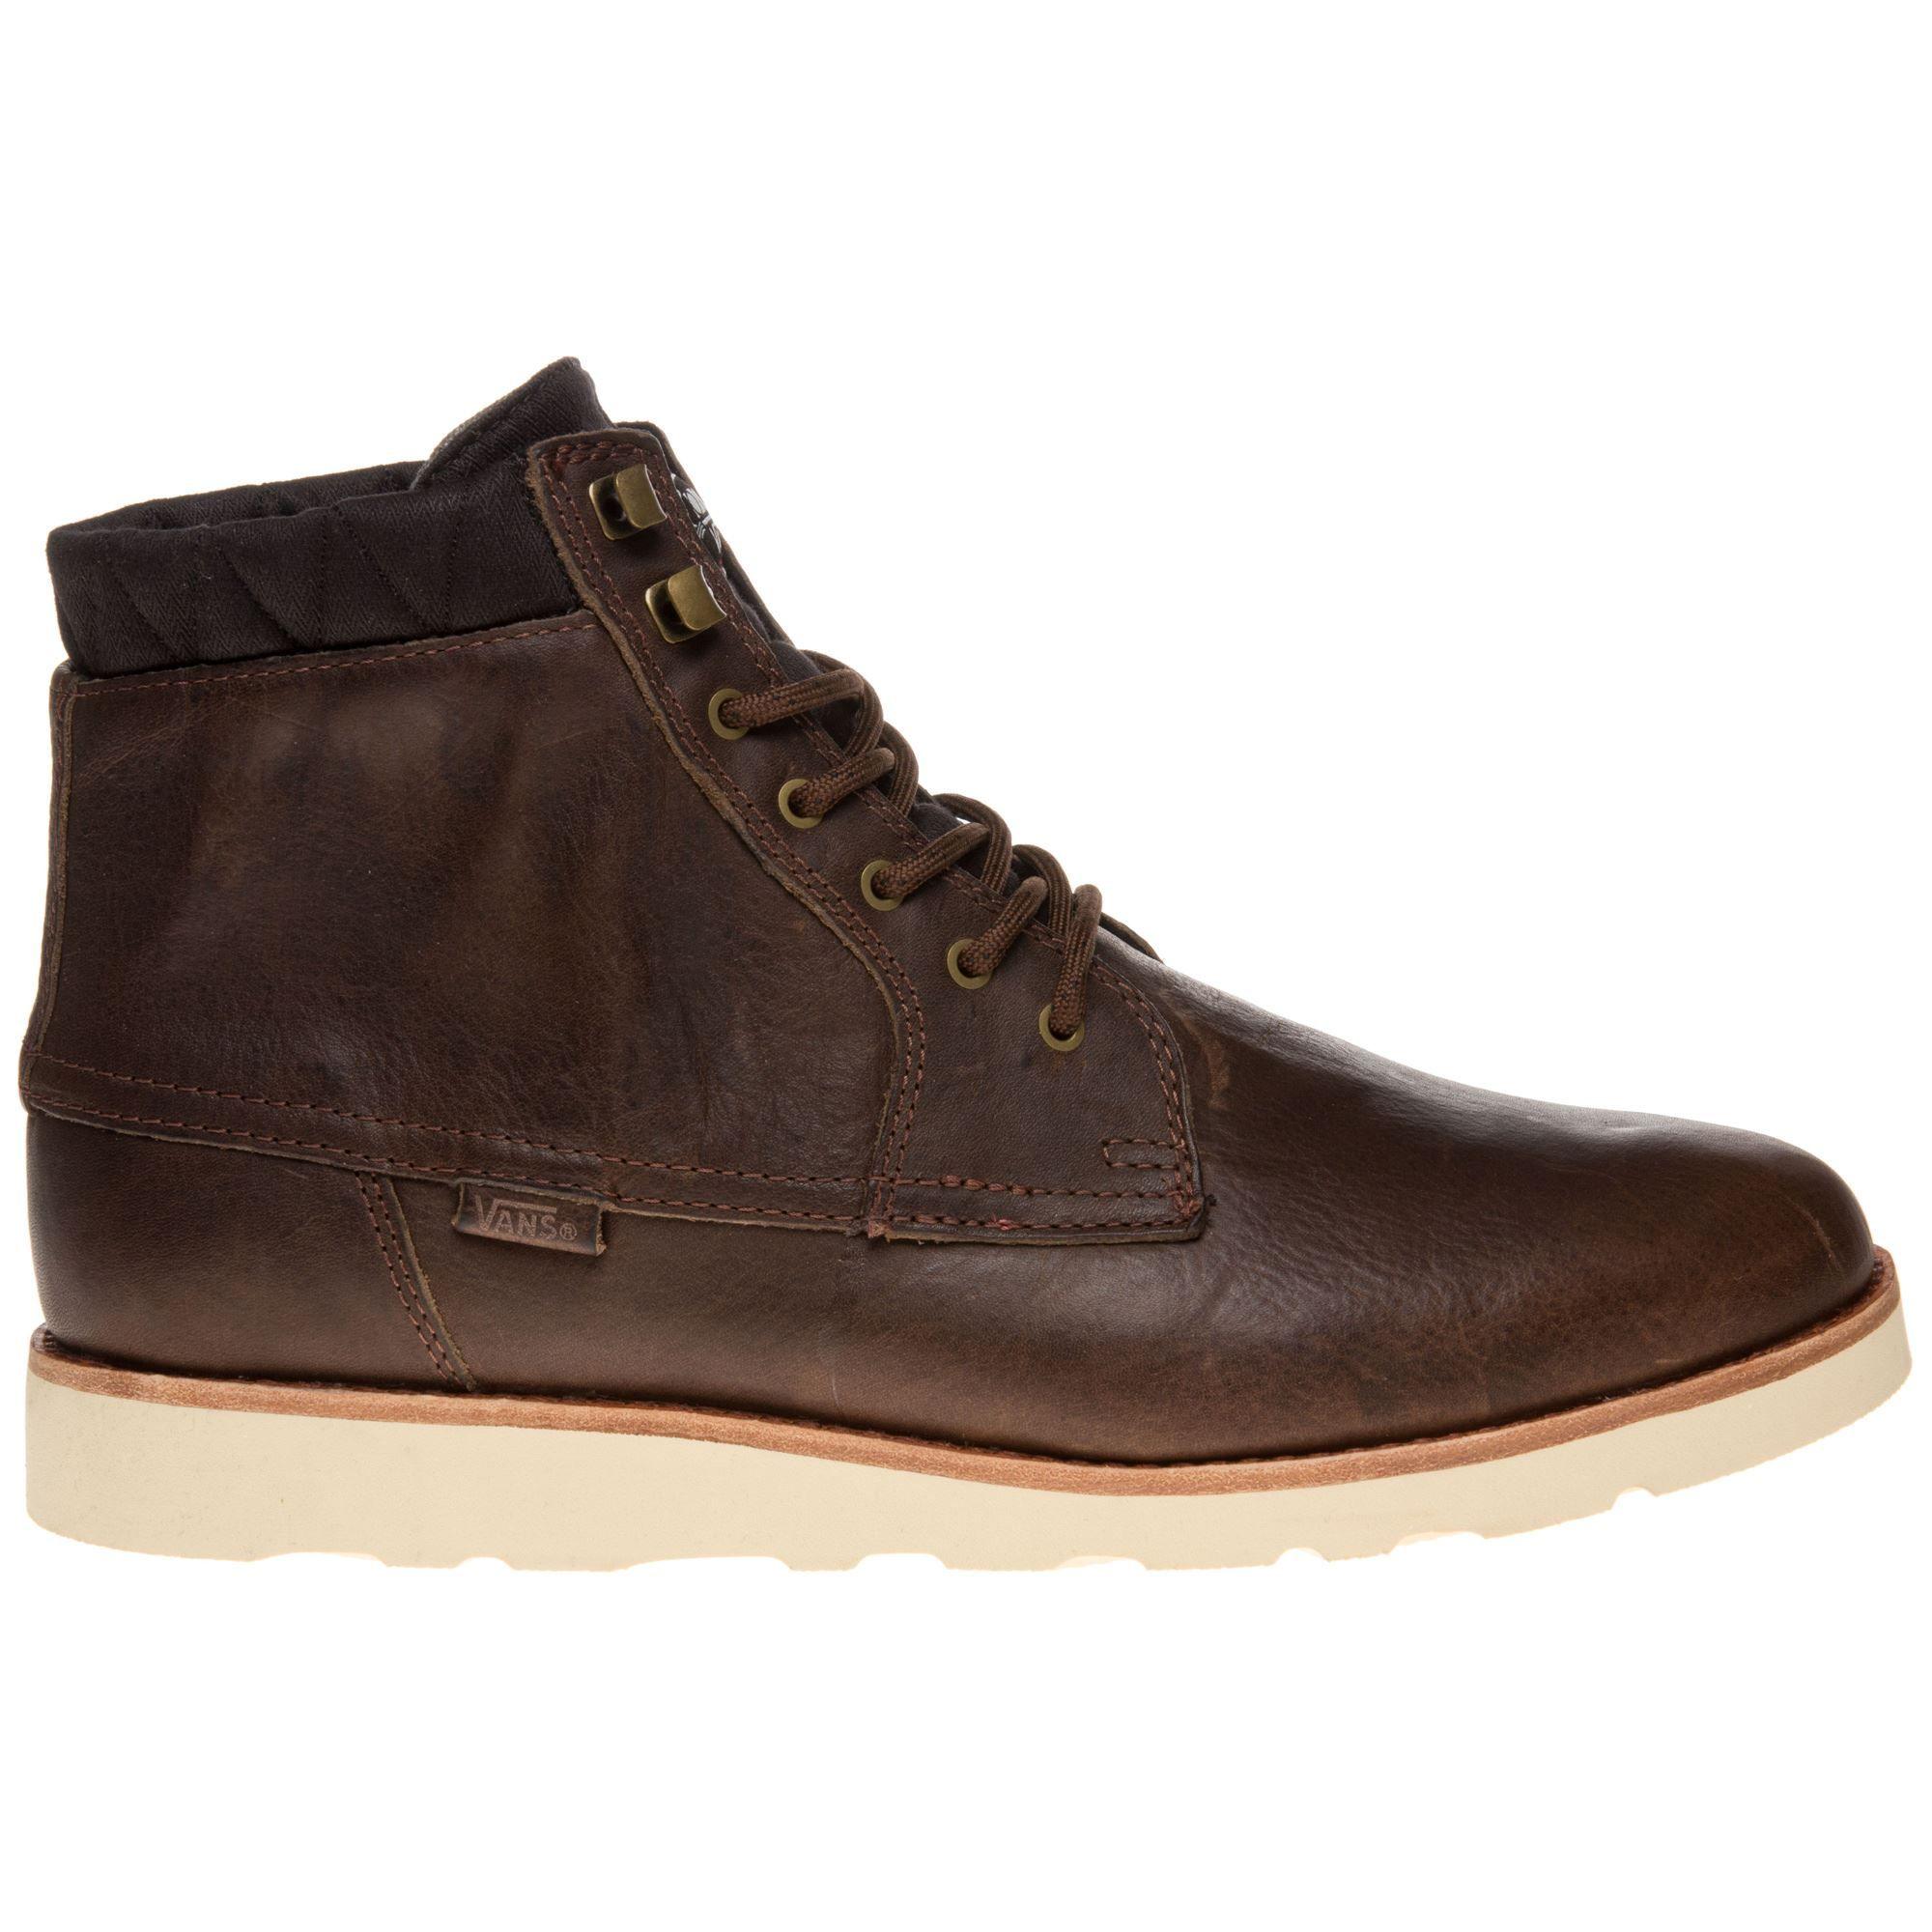 d71a7963bf http   www.soletrader.co.uk Vans-Breton-Boots pid-BRETONBN gclid ...